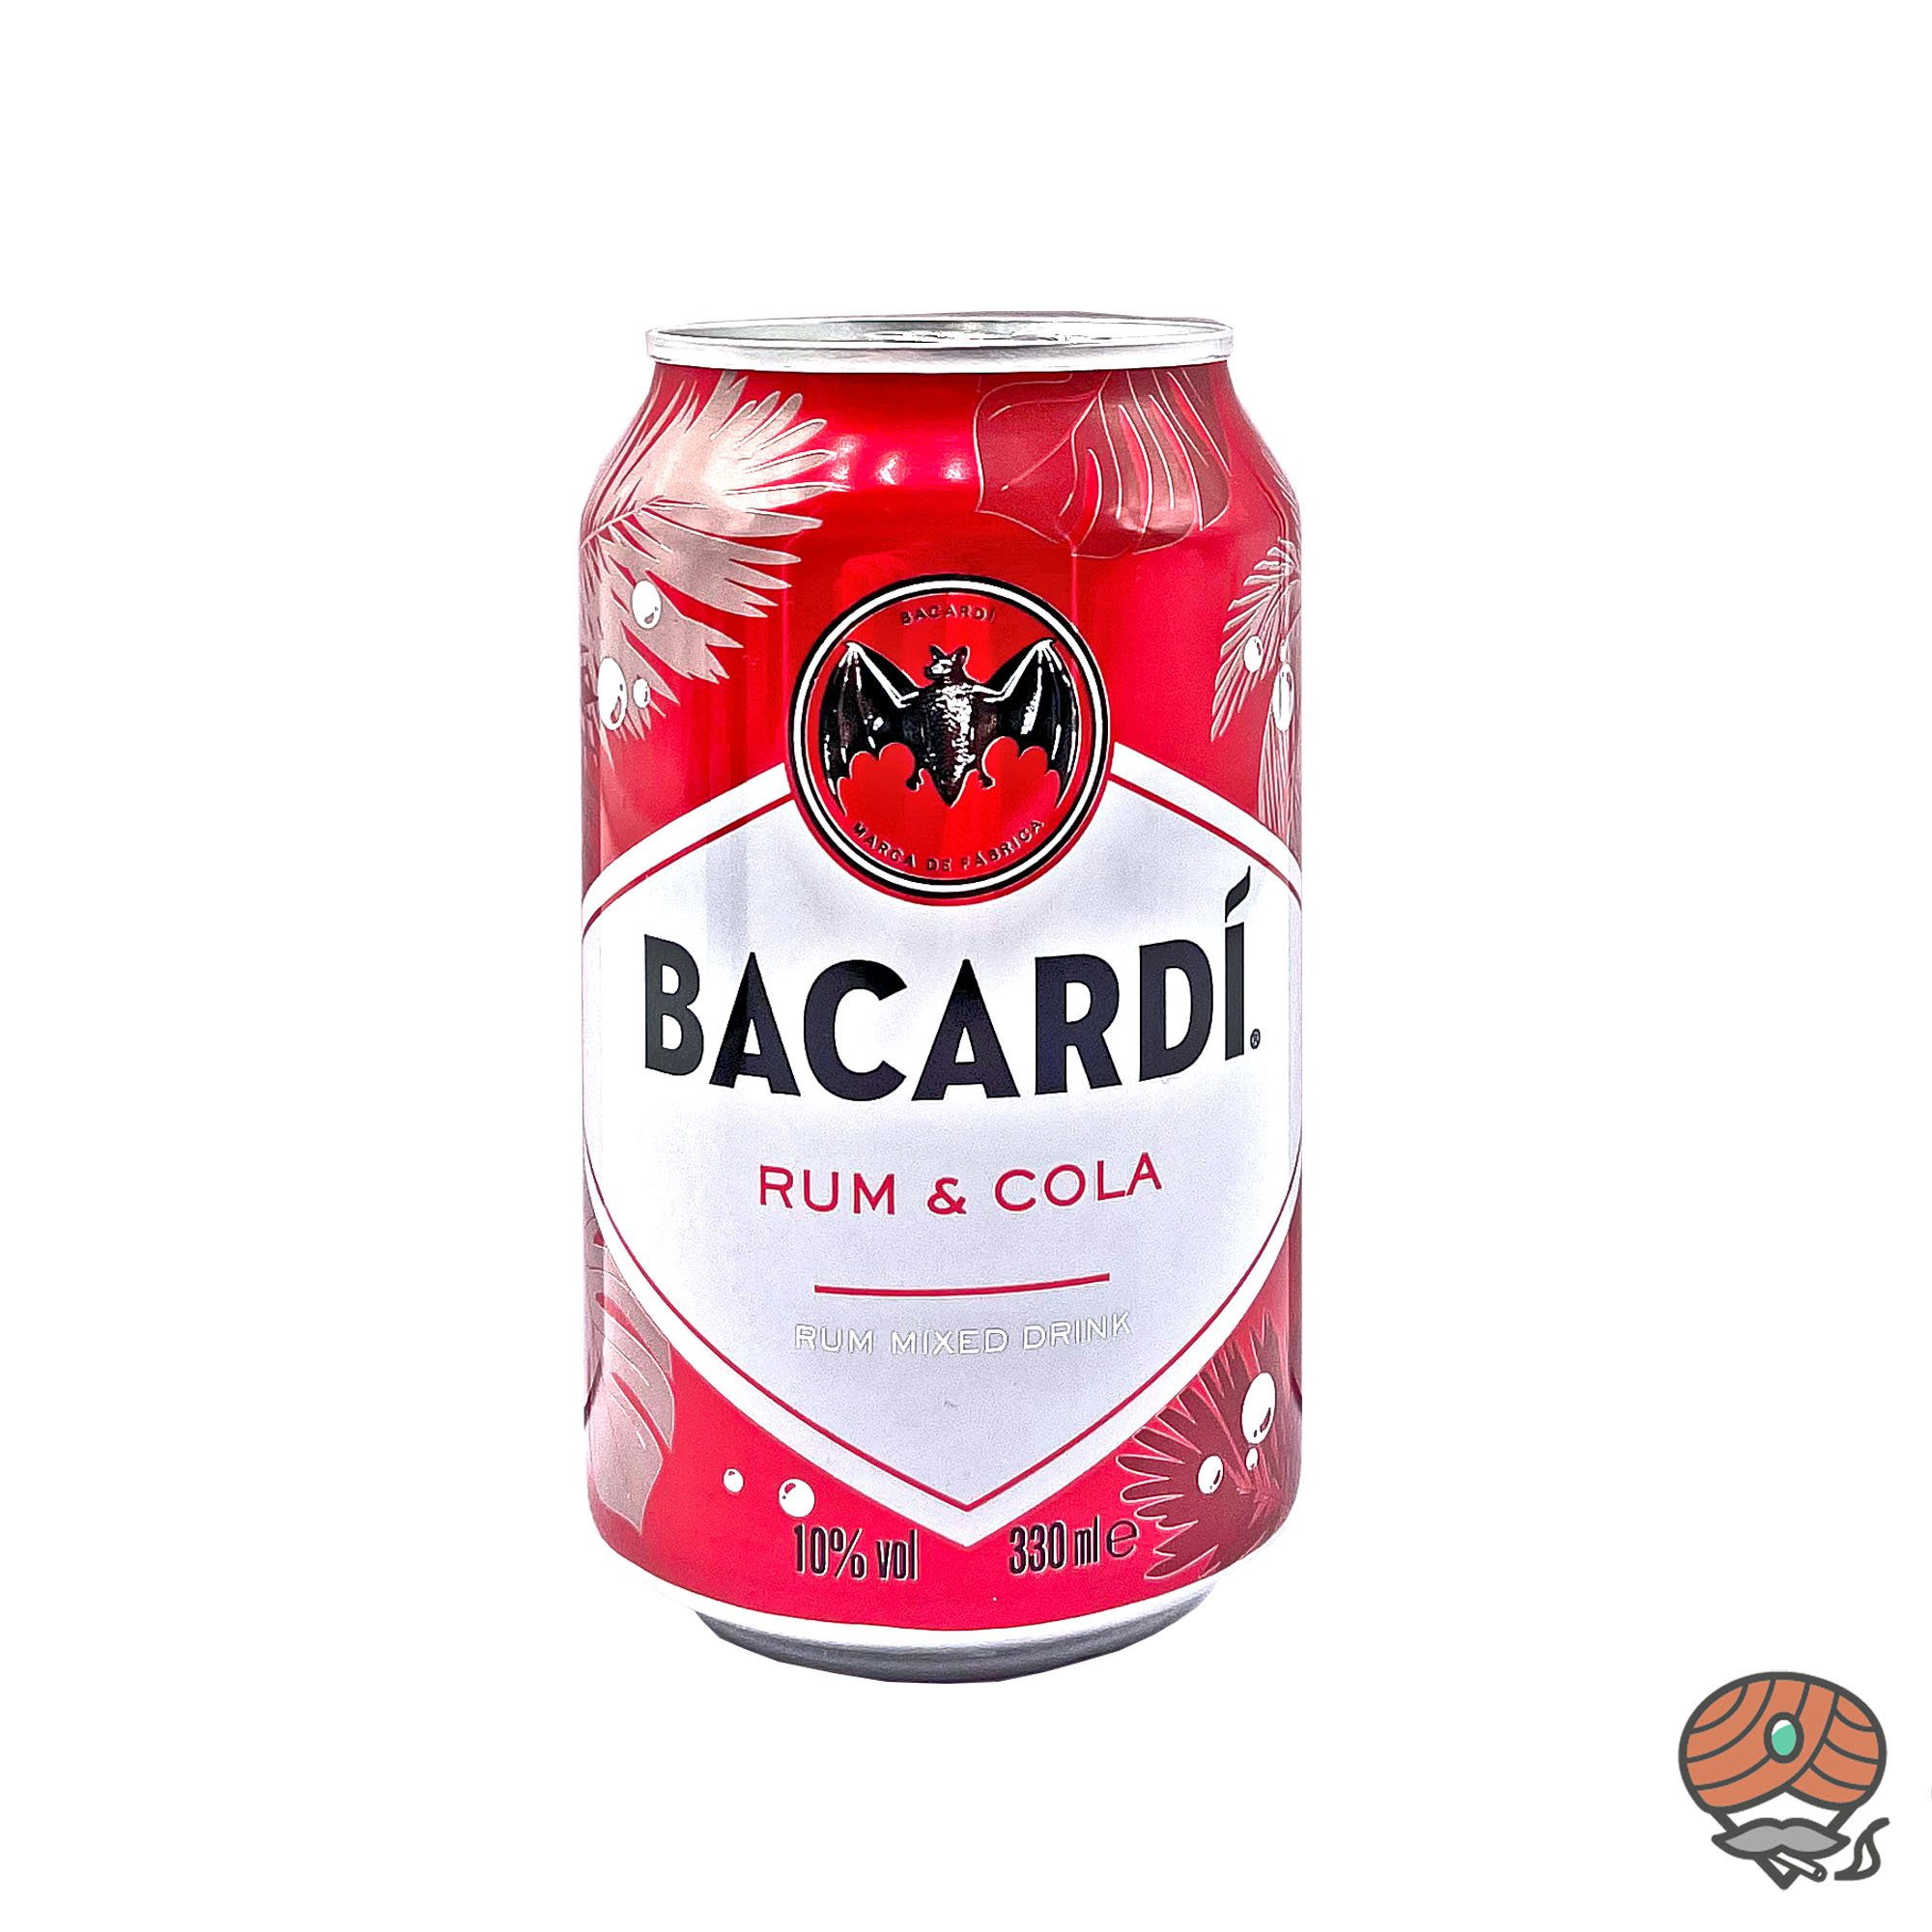 Bacardi Rum - Cola 0,33 l inkl.0,25 Euro Pfand (alc. 10% Vol)